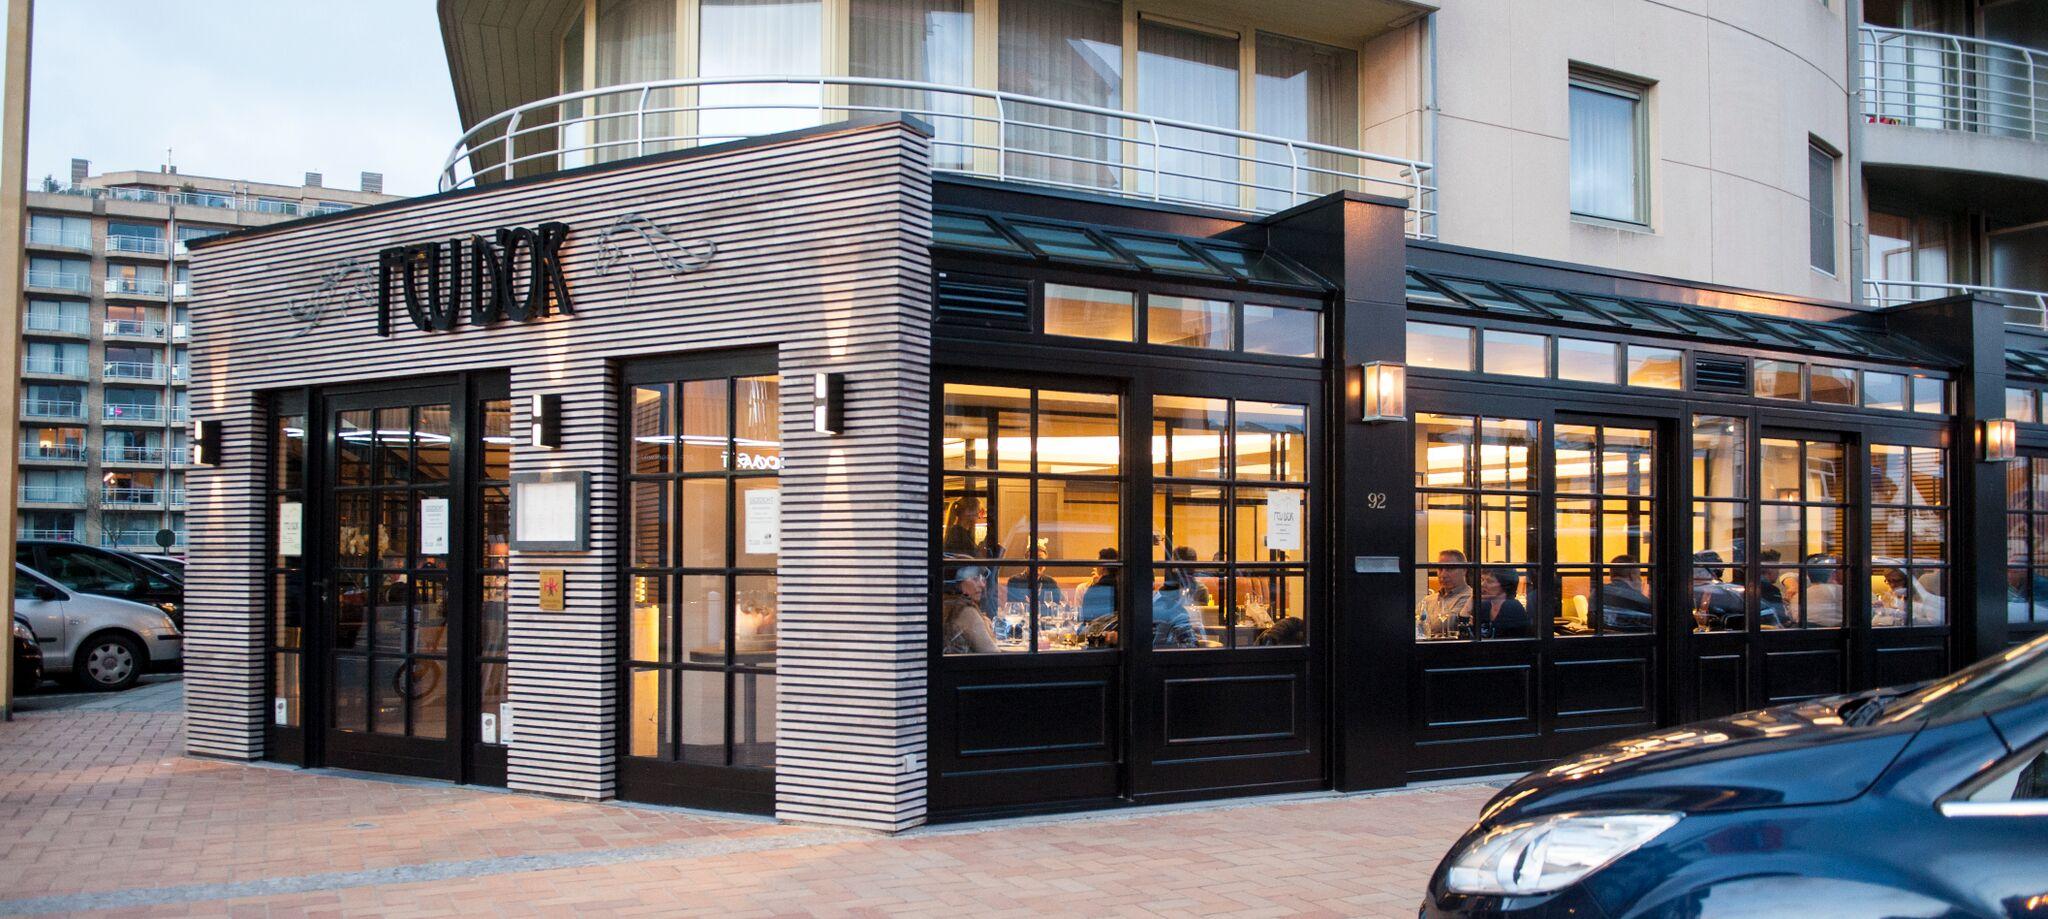 28 feu d or nieuwpoort restaurant tablefever bart albrecht fotograaf.jpeg